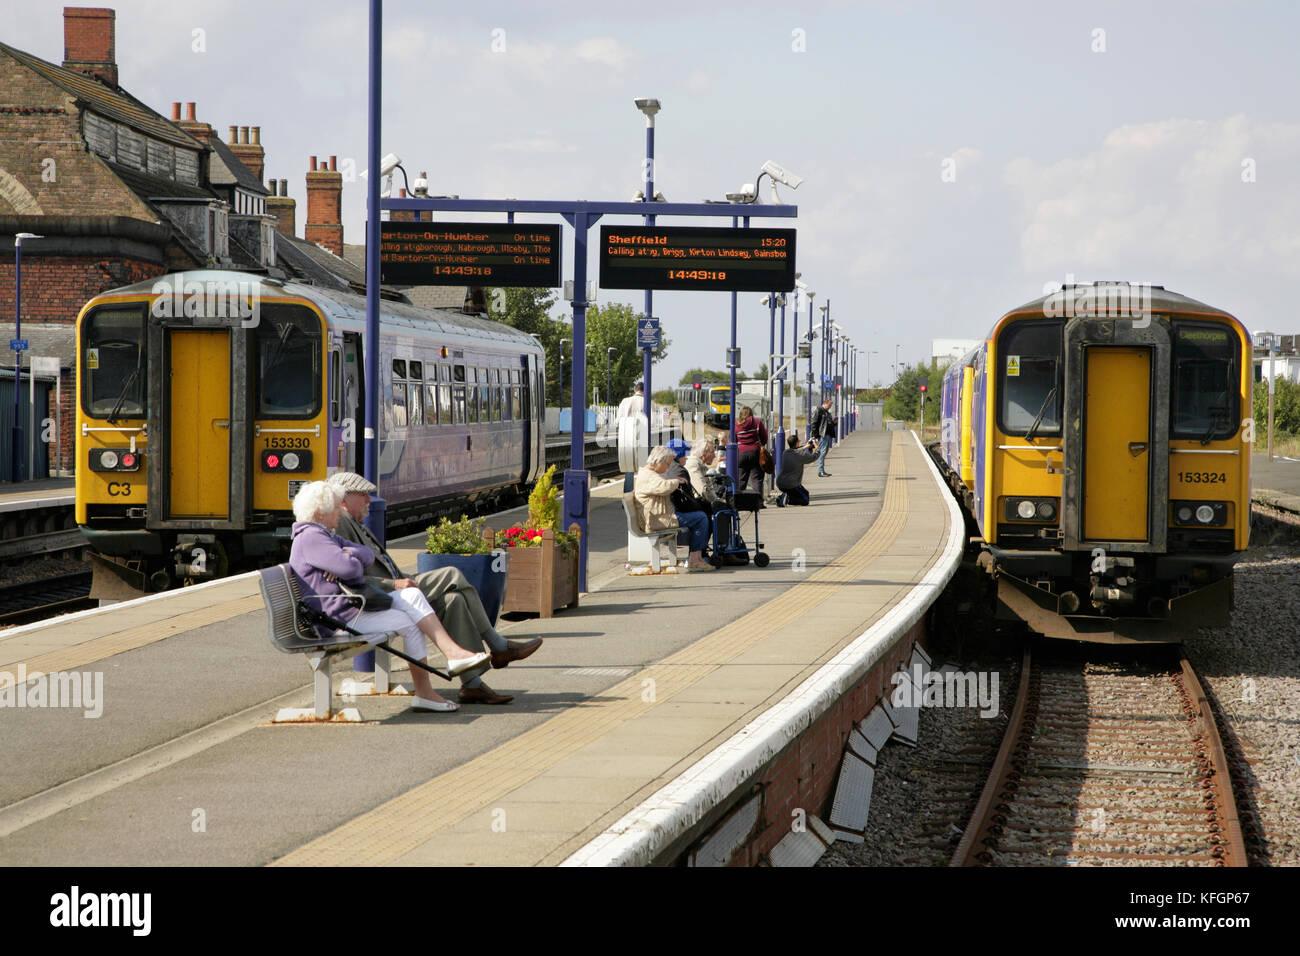 Trains and passengers at Cleethorpes station, UK. - Stock Image